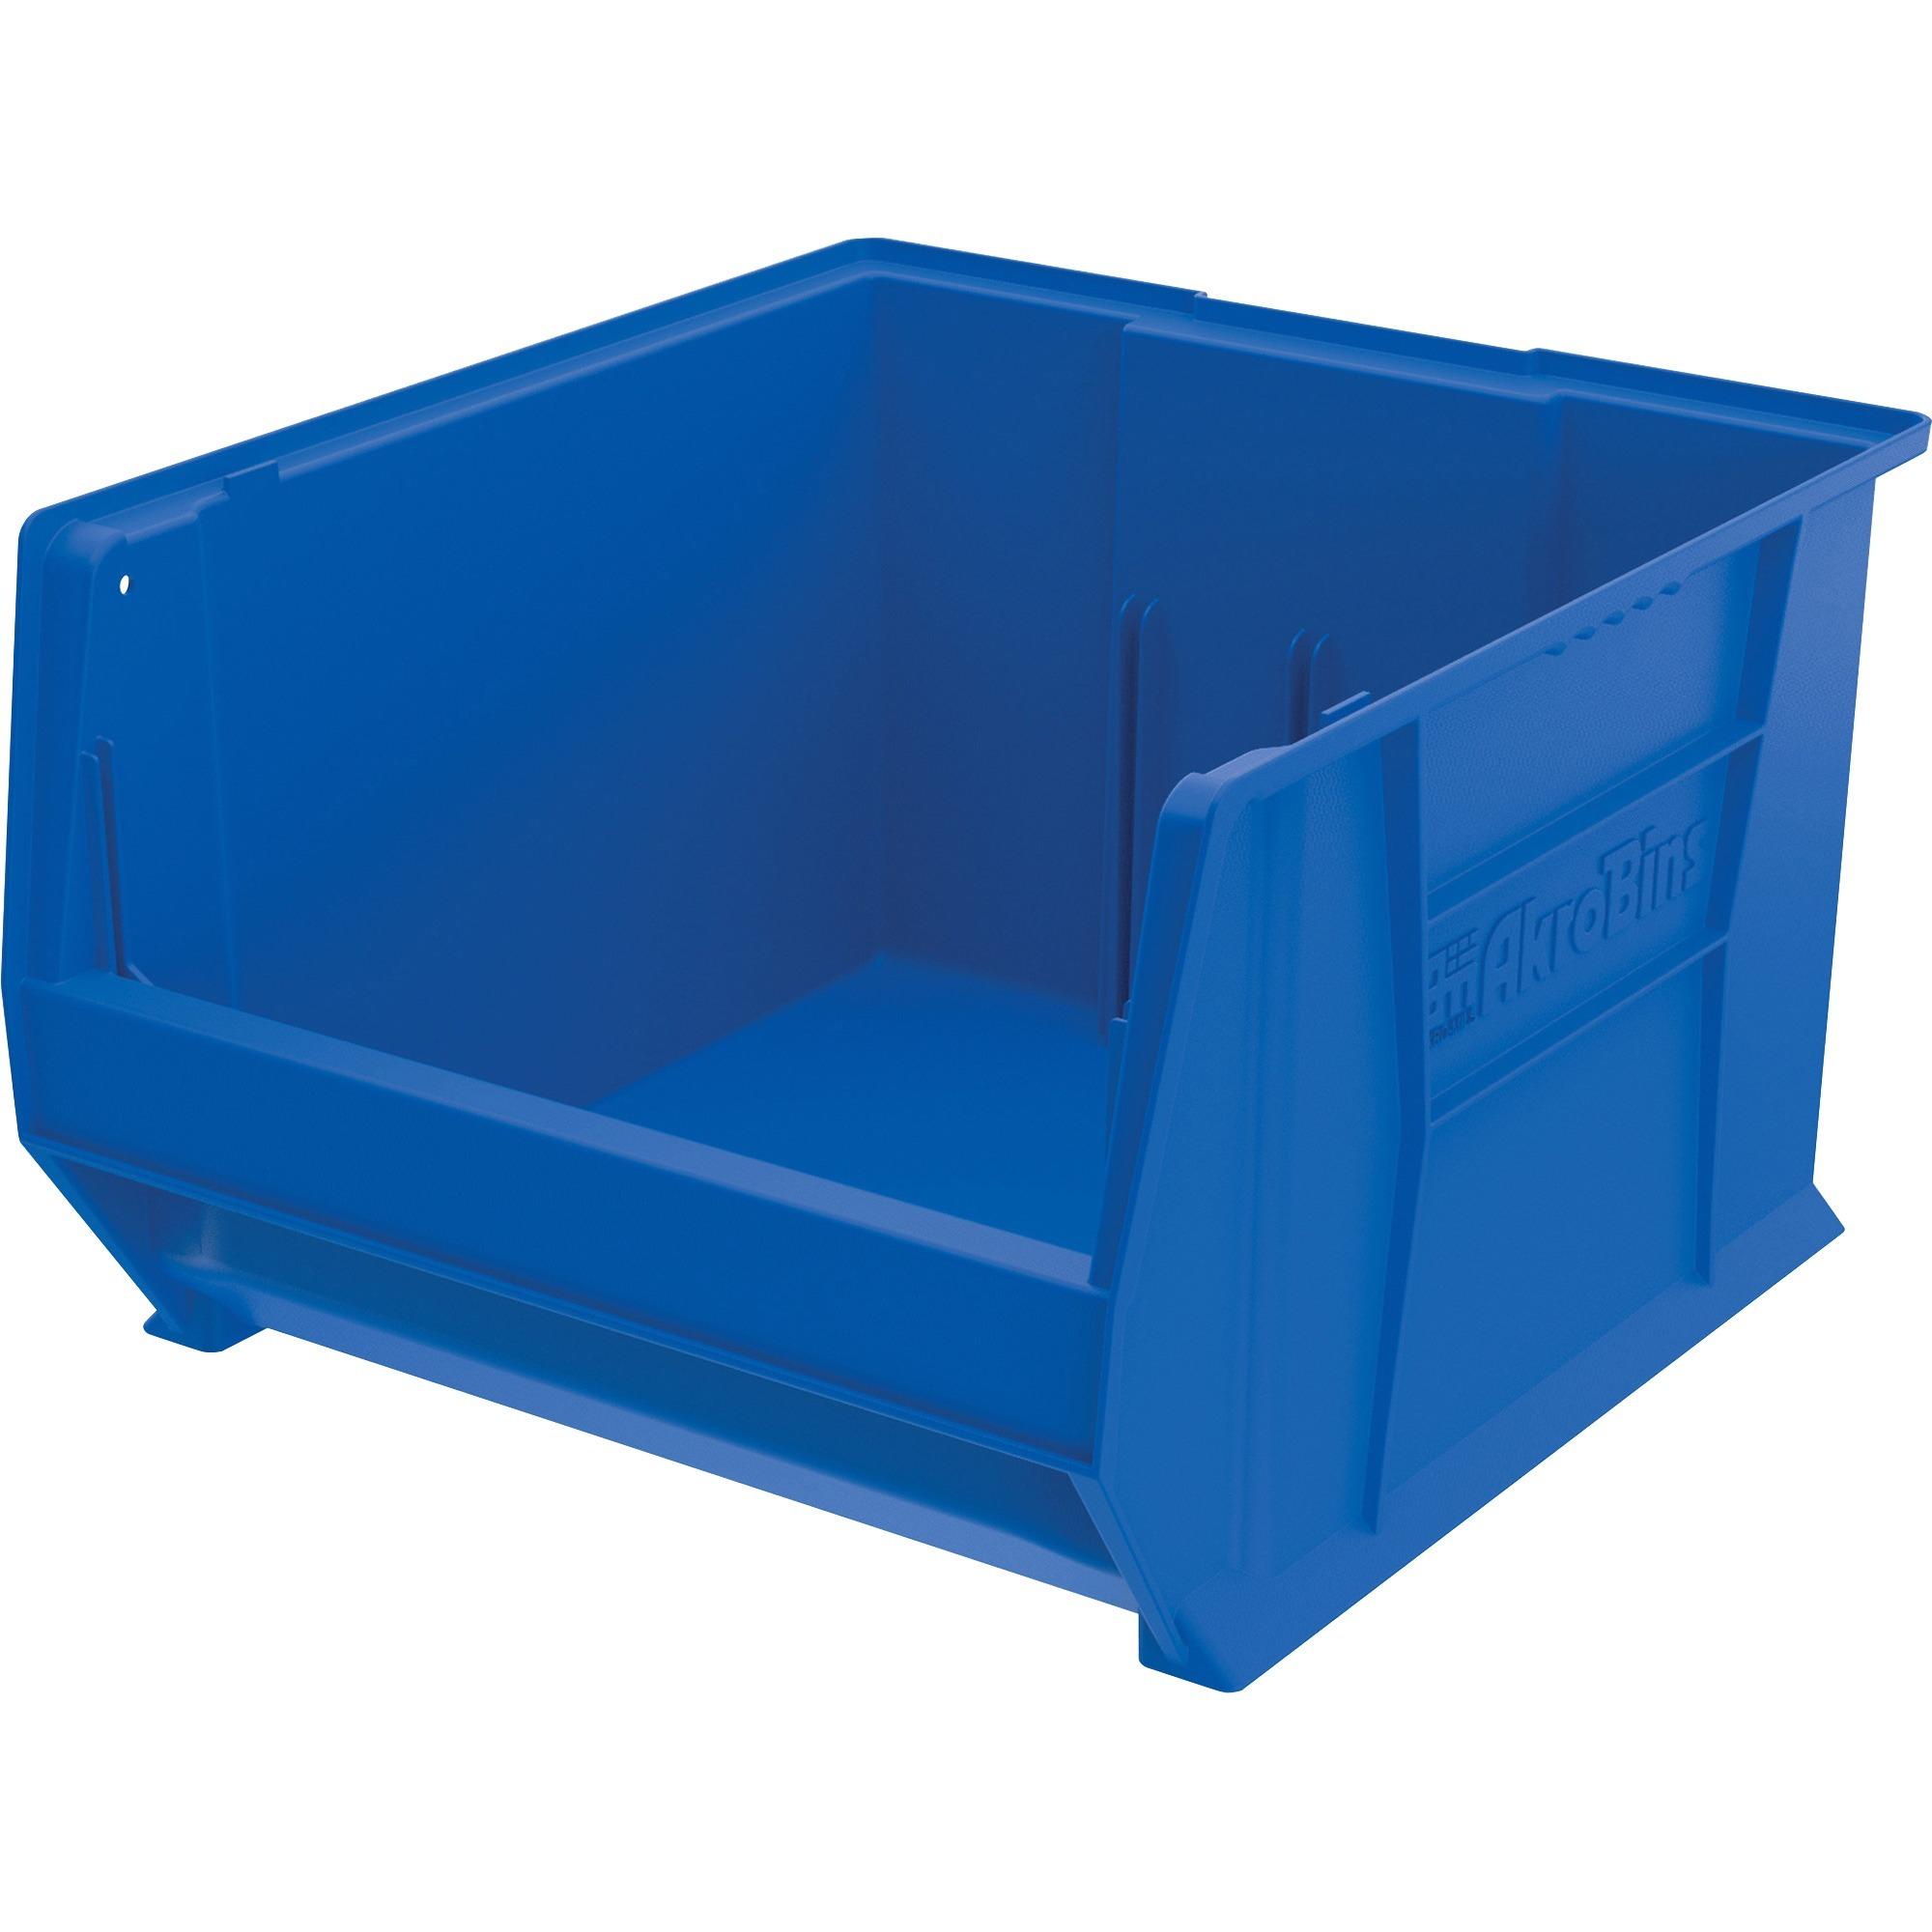 Image for Akro-mils / Myers Industries, Inc Akro-mils Super-size Akrobin - Internal Dimensions: 16.56 Width X 16.87 Depth X 11.37 Height - External Dimensions: 18.4 Width X 20 Depth X 12 Height - 300 Lb - Heavy Duty - Stackable - Polymer - Blue - 1 Each